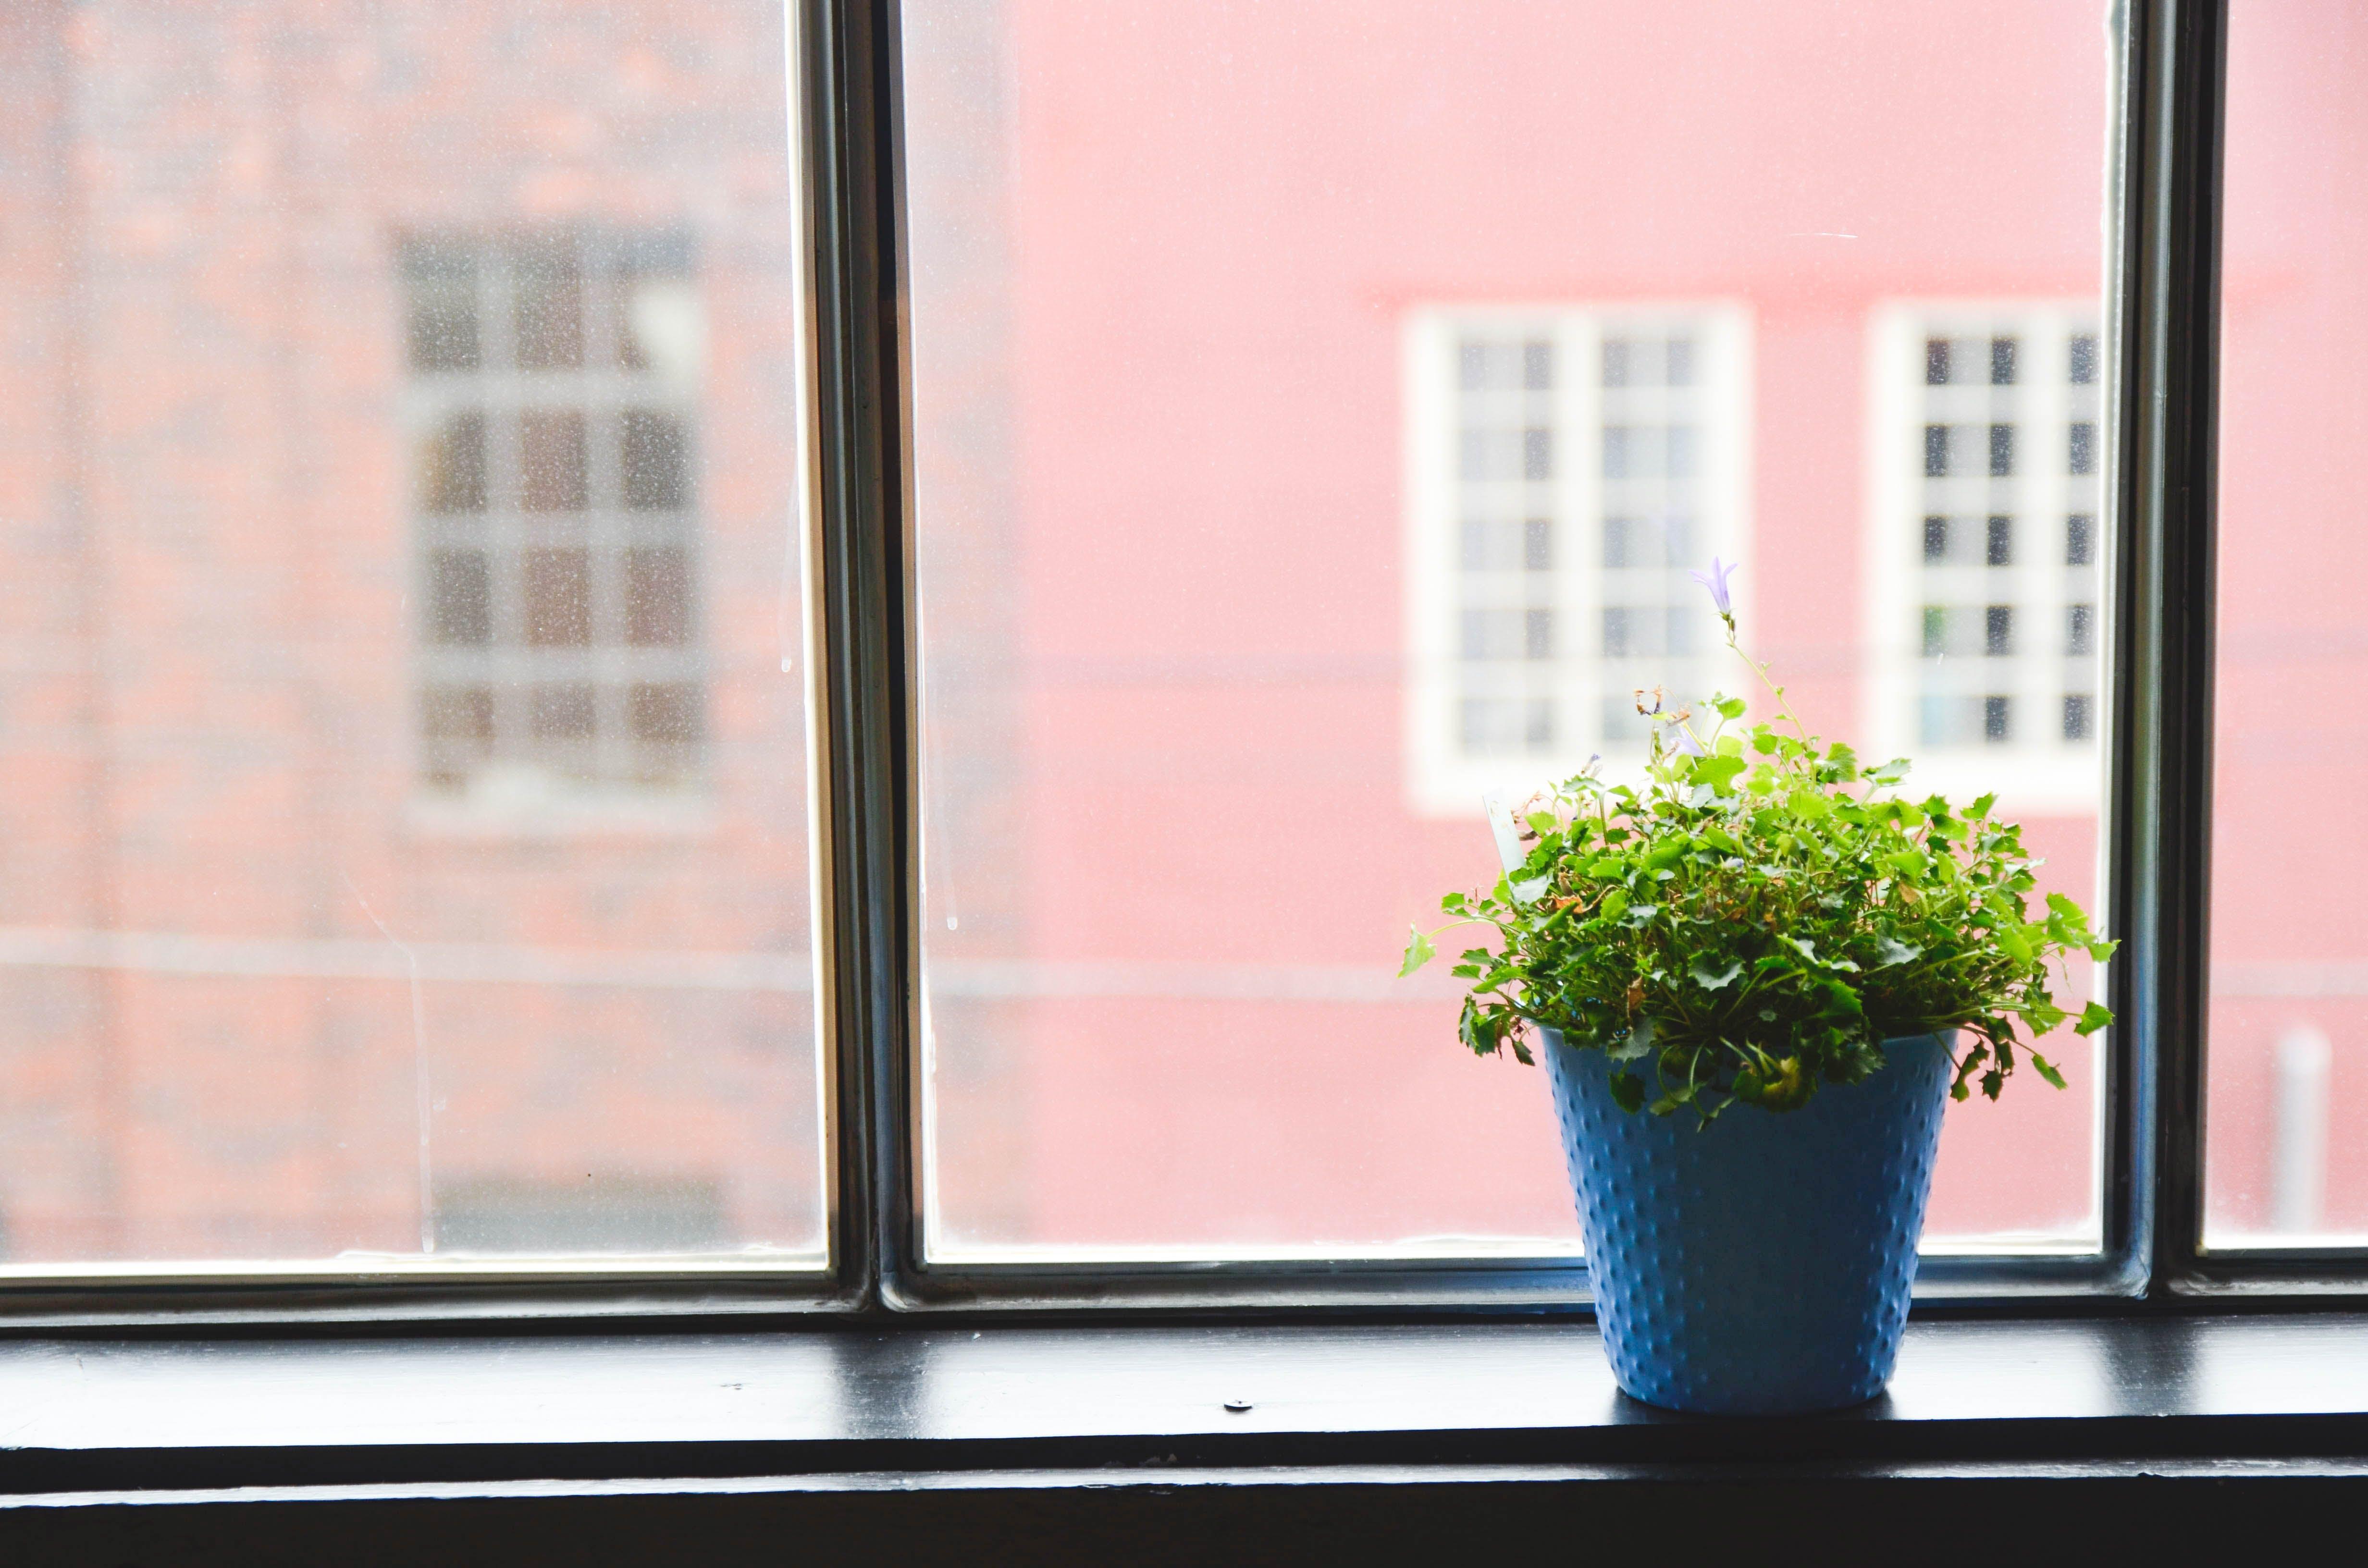 Free stock photo of windows